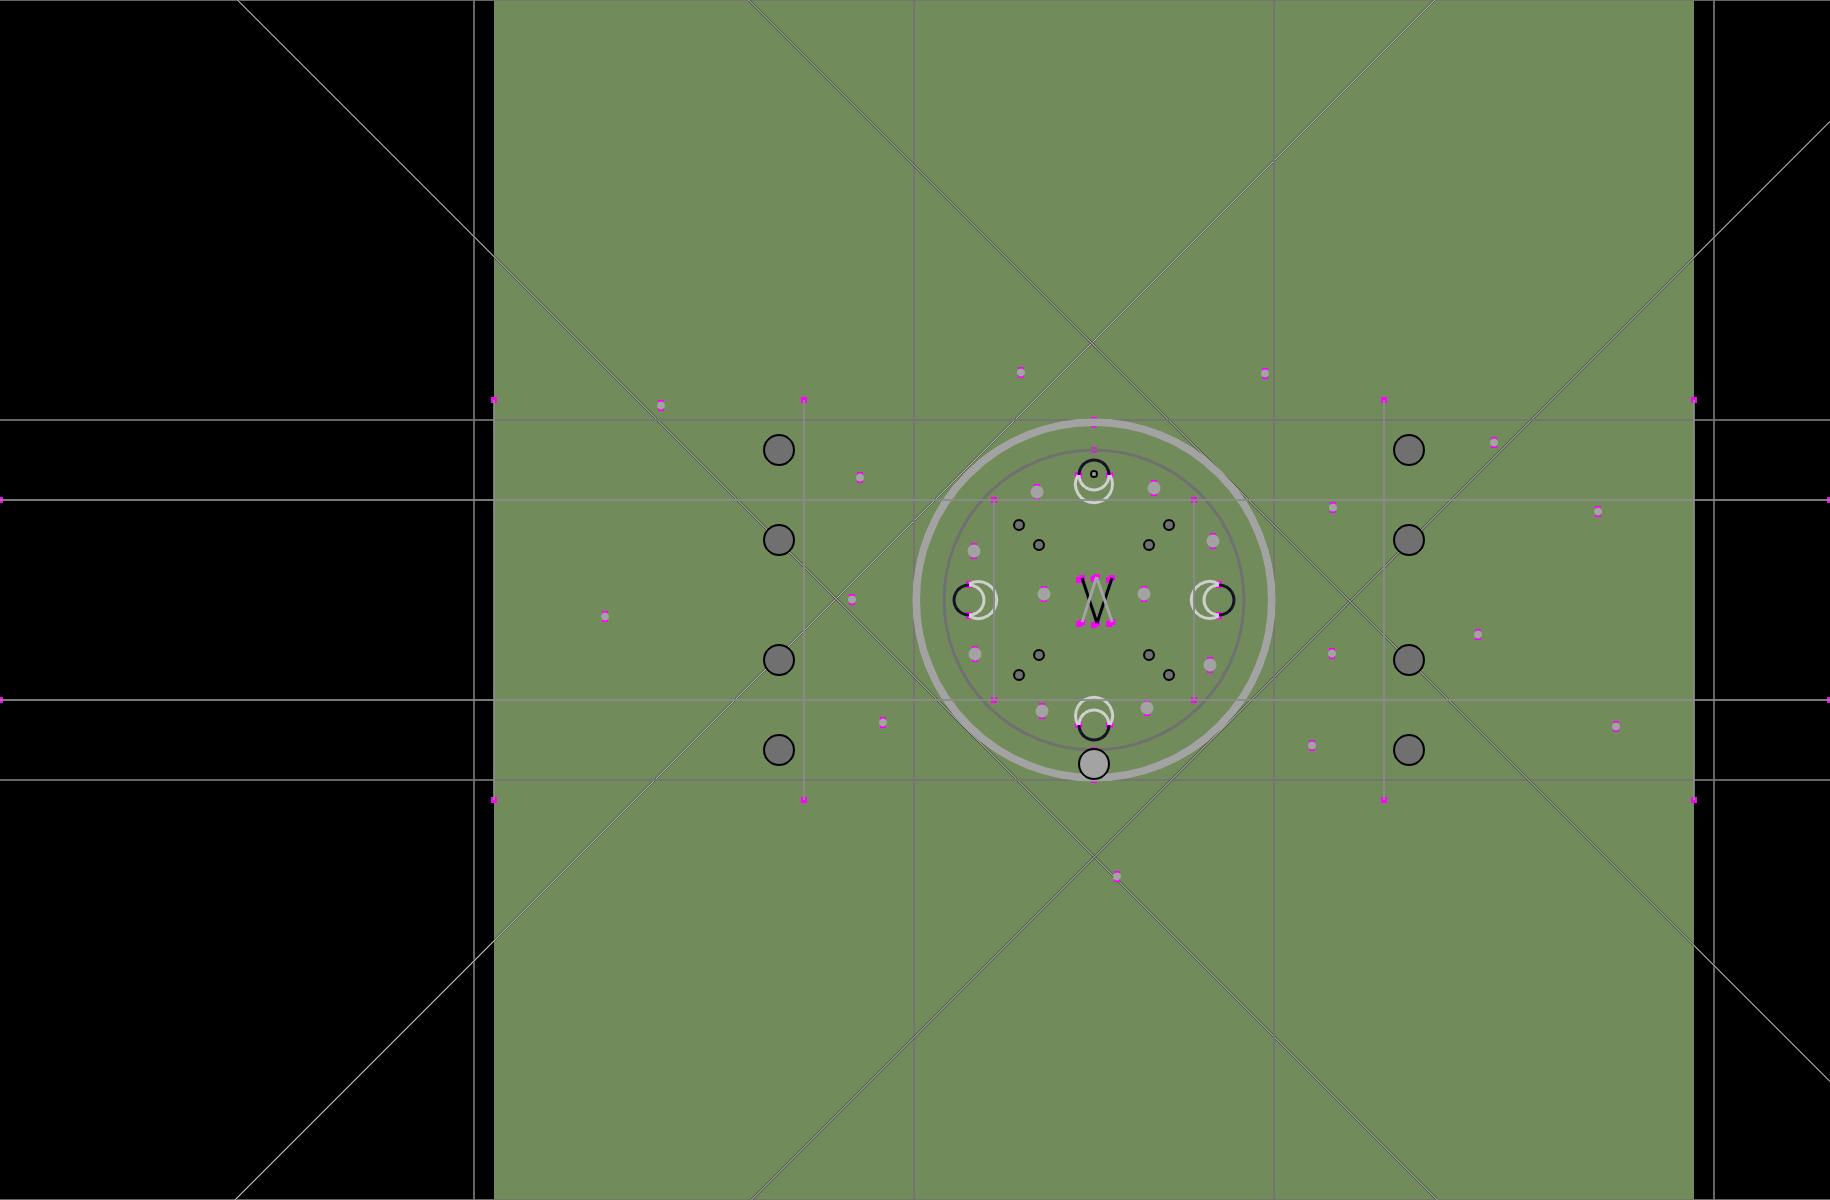 hax ball maps | Moonchair by valn v5